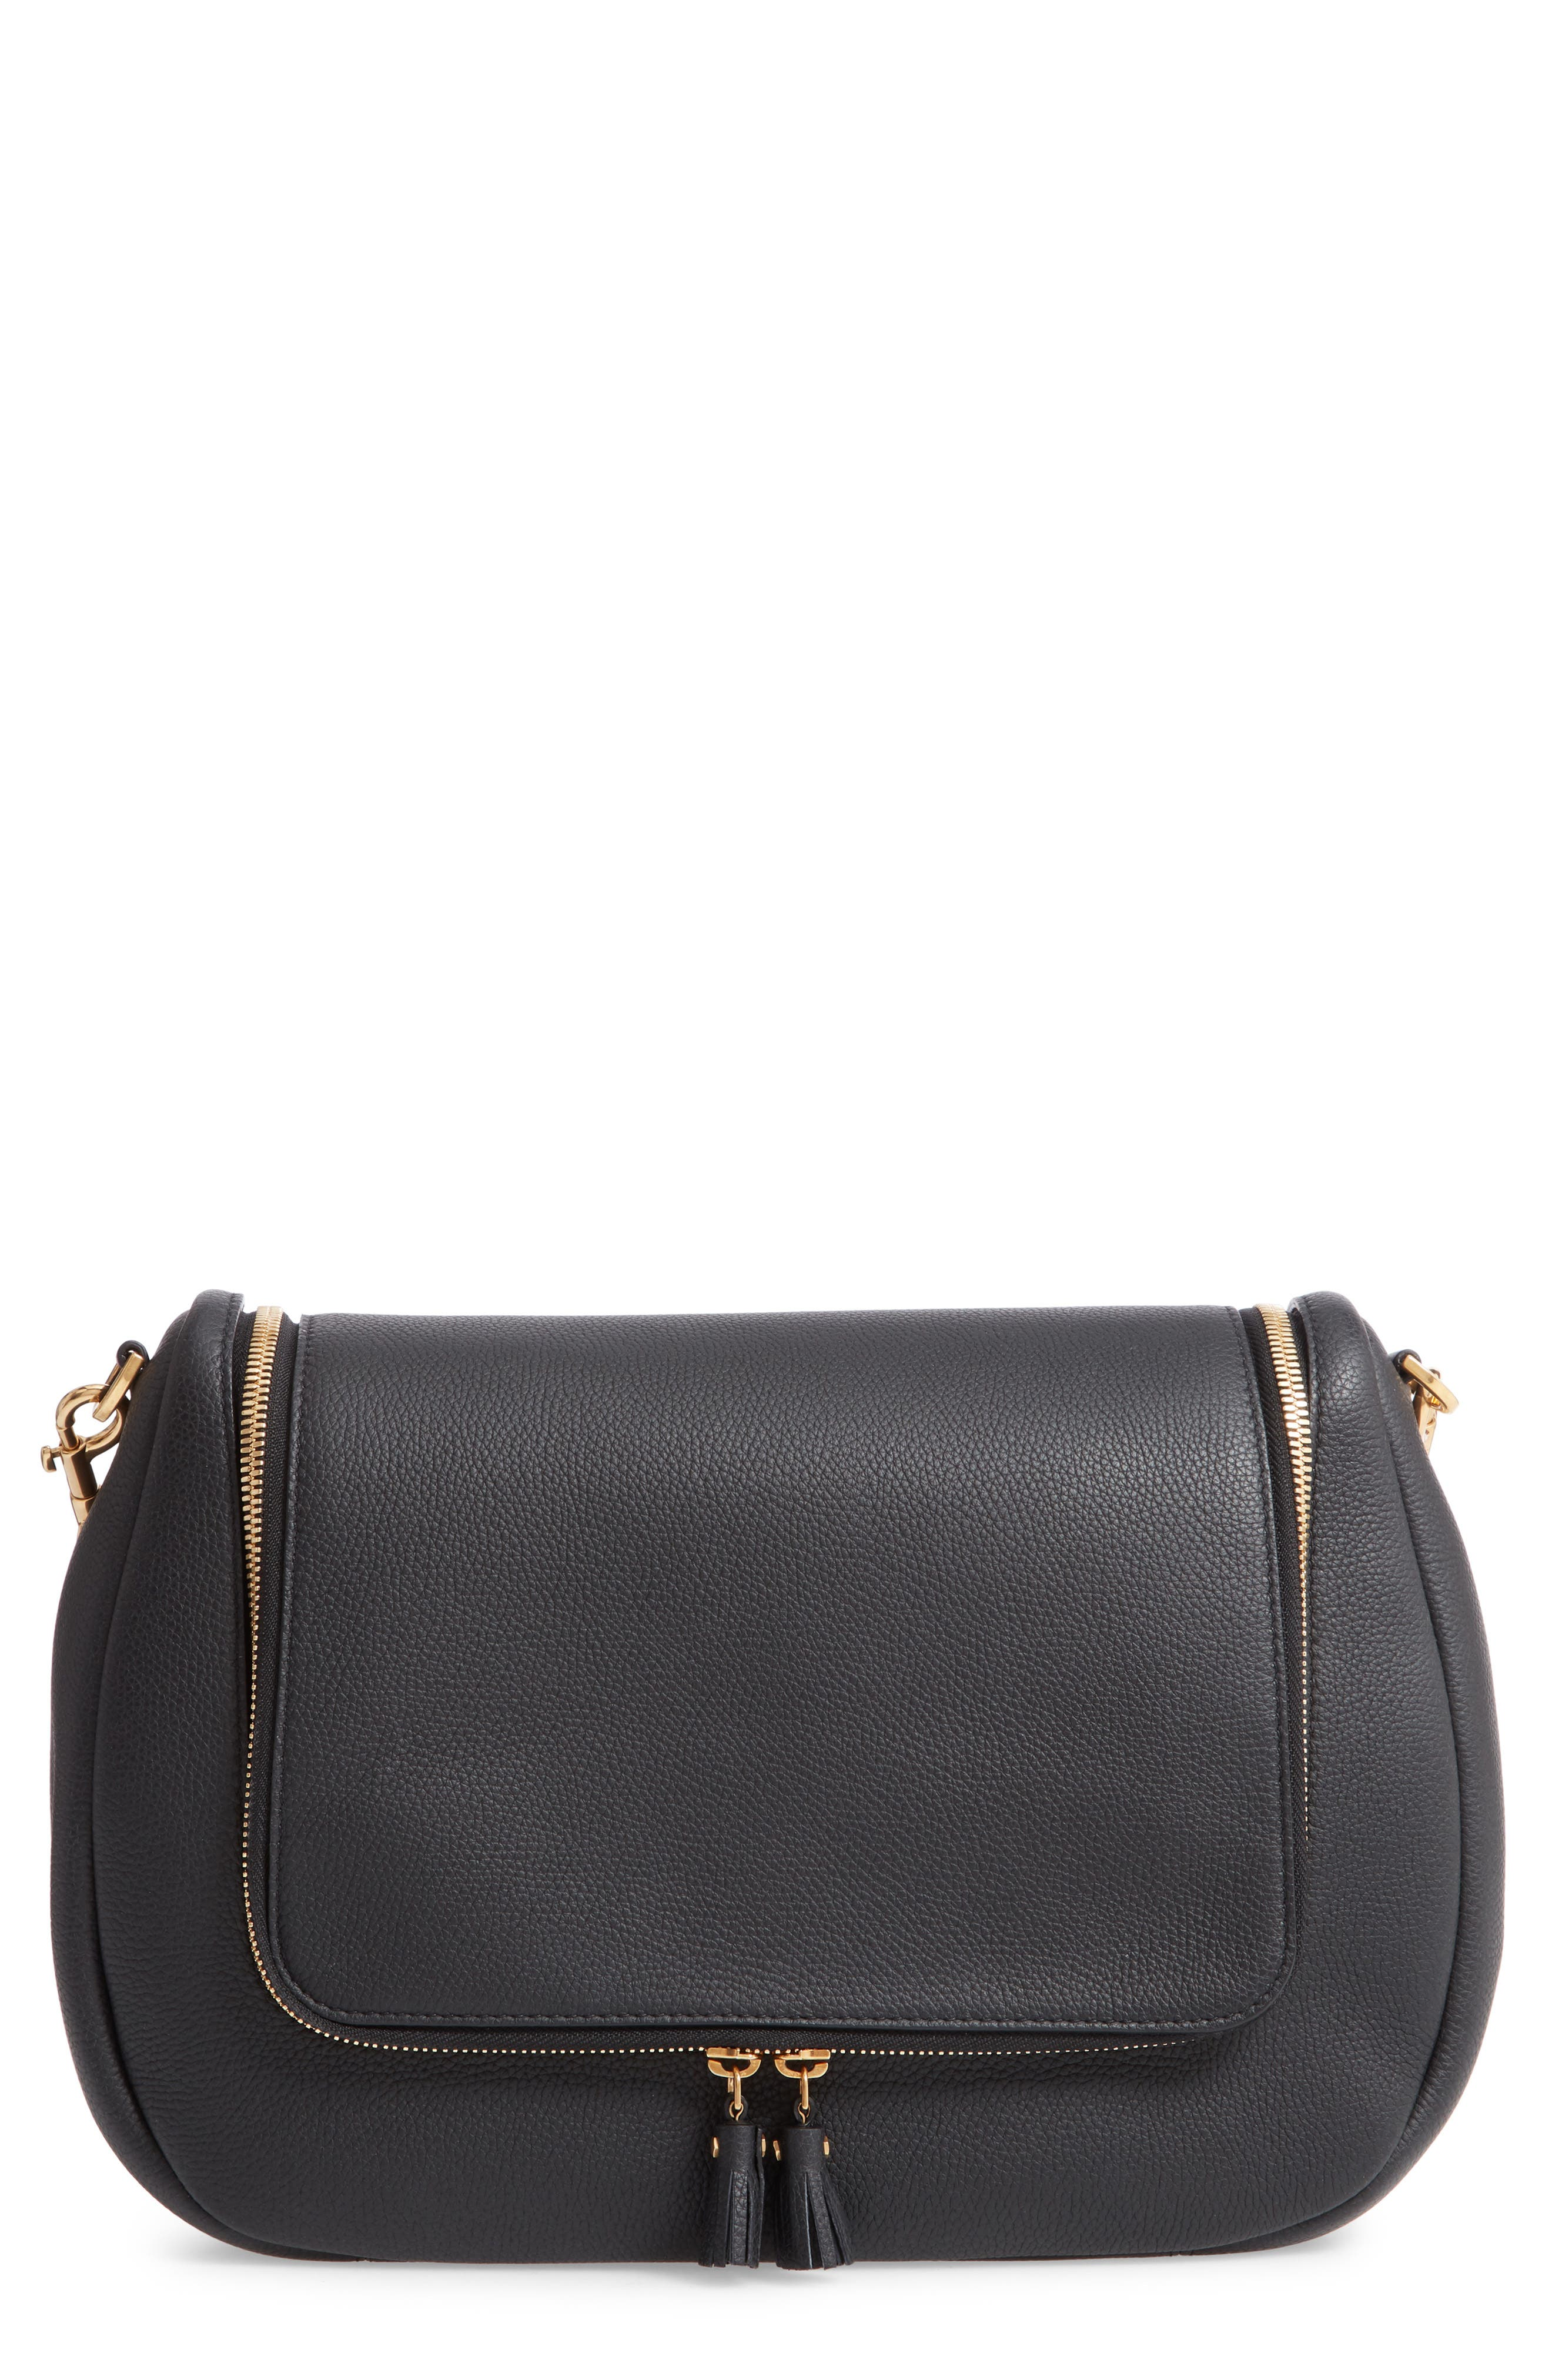 Maxi Vere Soft Satchel Shoulder Bag,                             Main thumbnail 1, color,                             BLACK